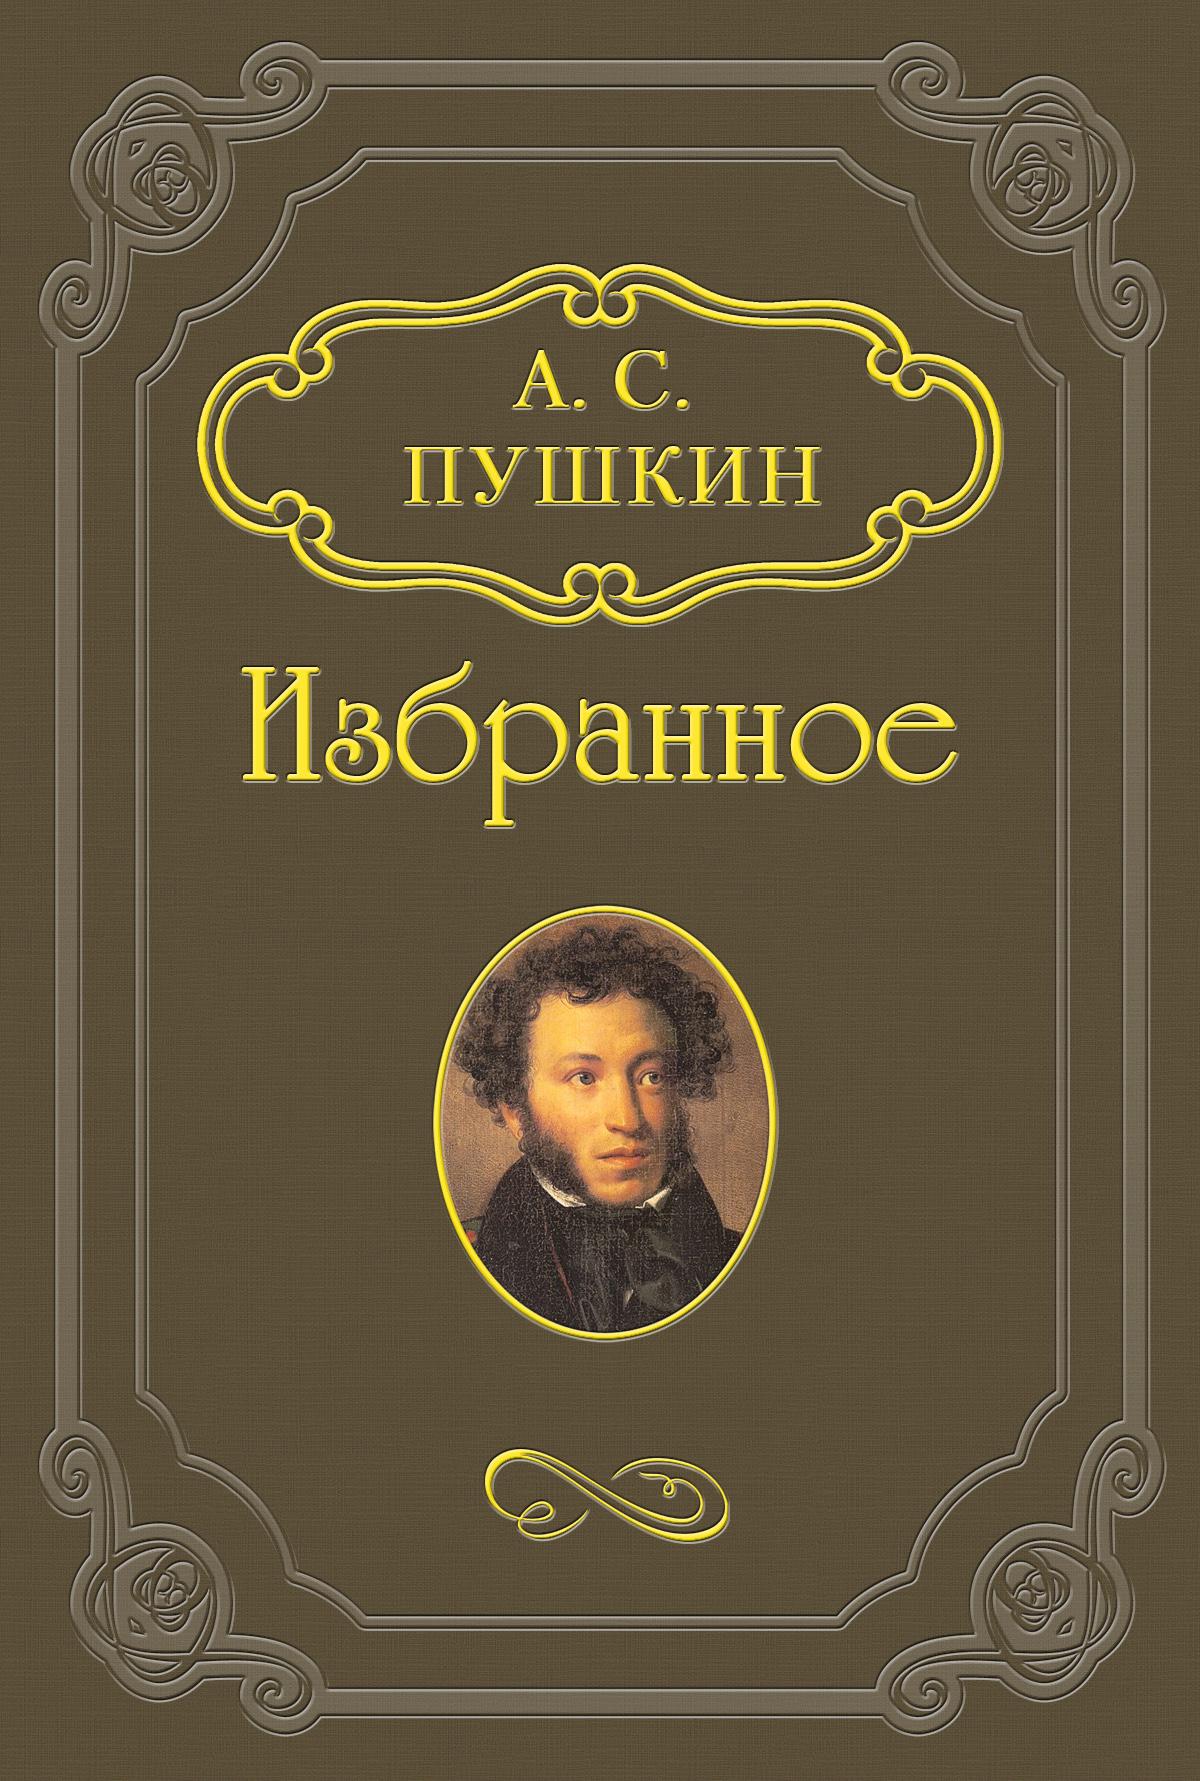 Александр Пушкин Вадим александр пушкин барышня крестьянка спектакль